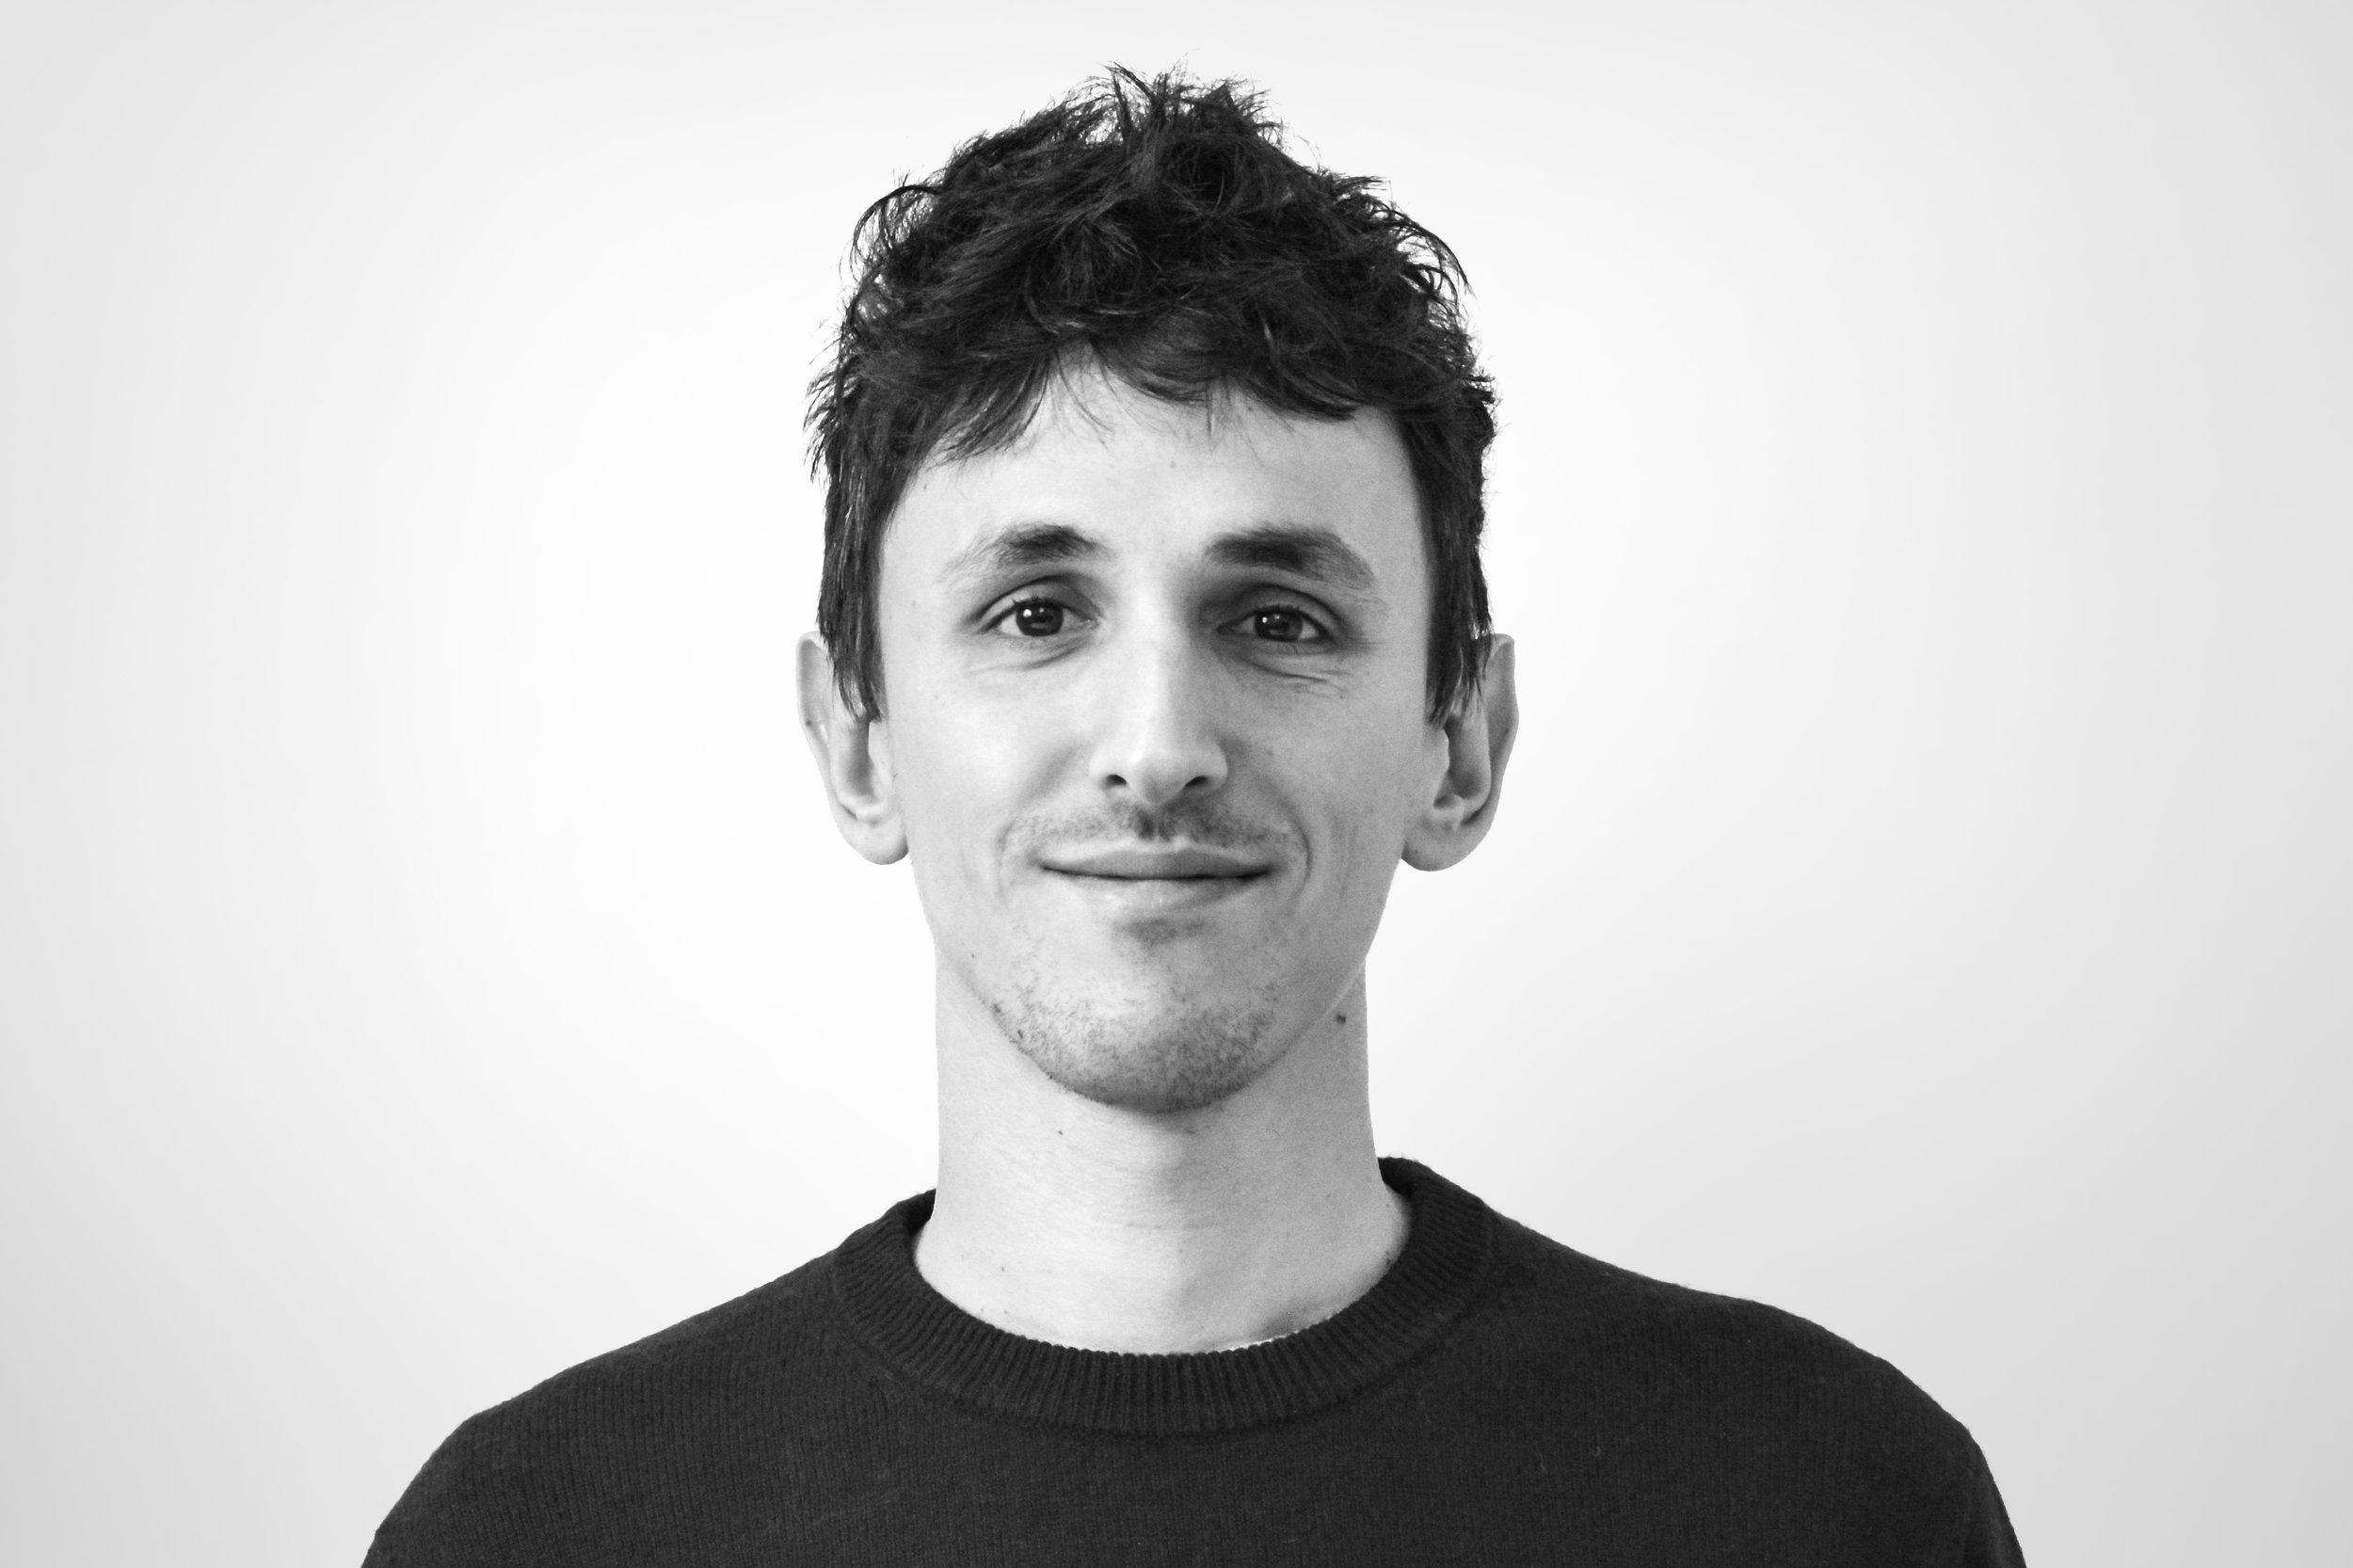 Marco Buonocore  Architect, M.Arch  mar@effekt.dk